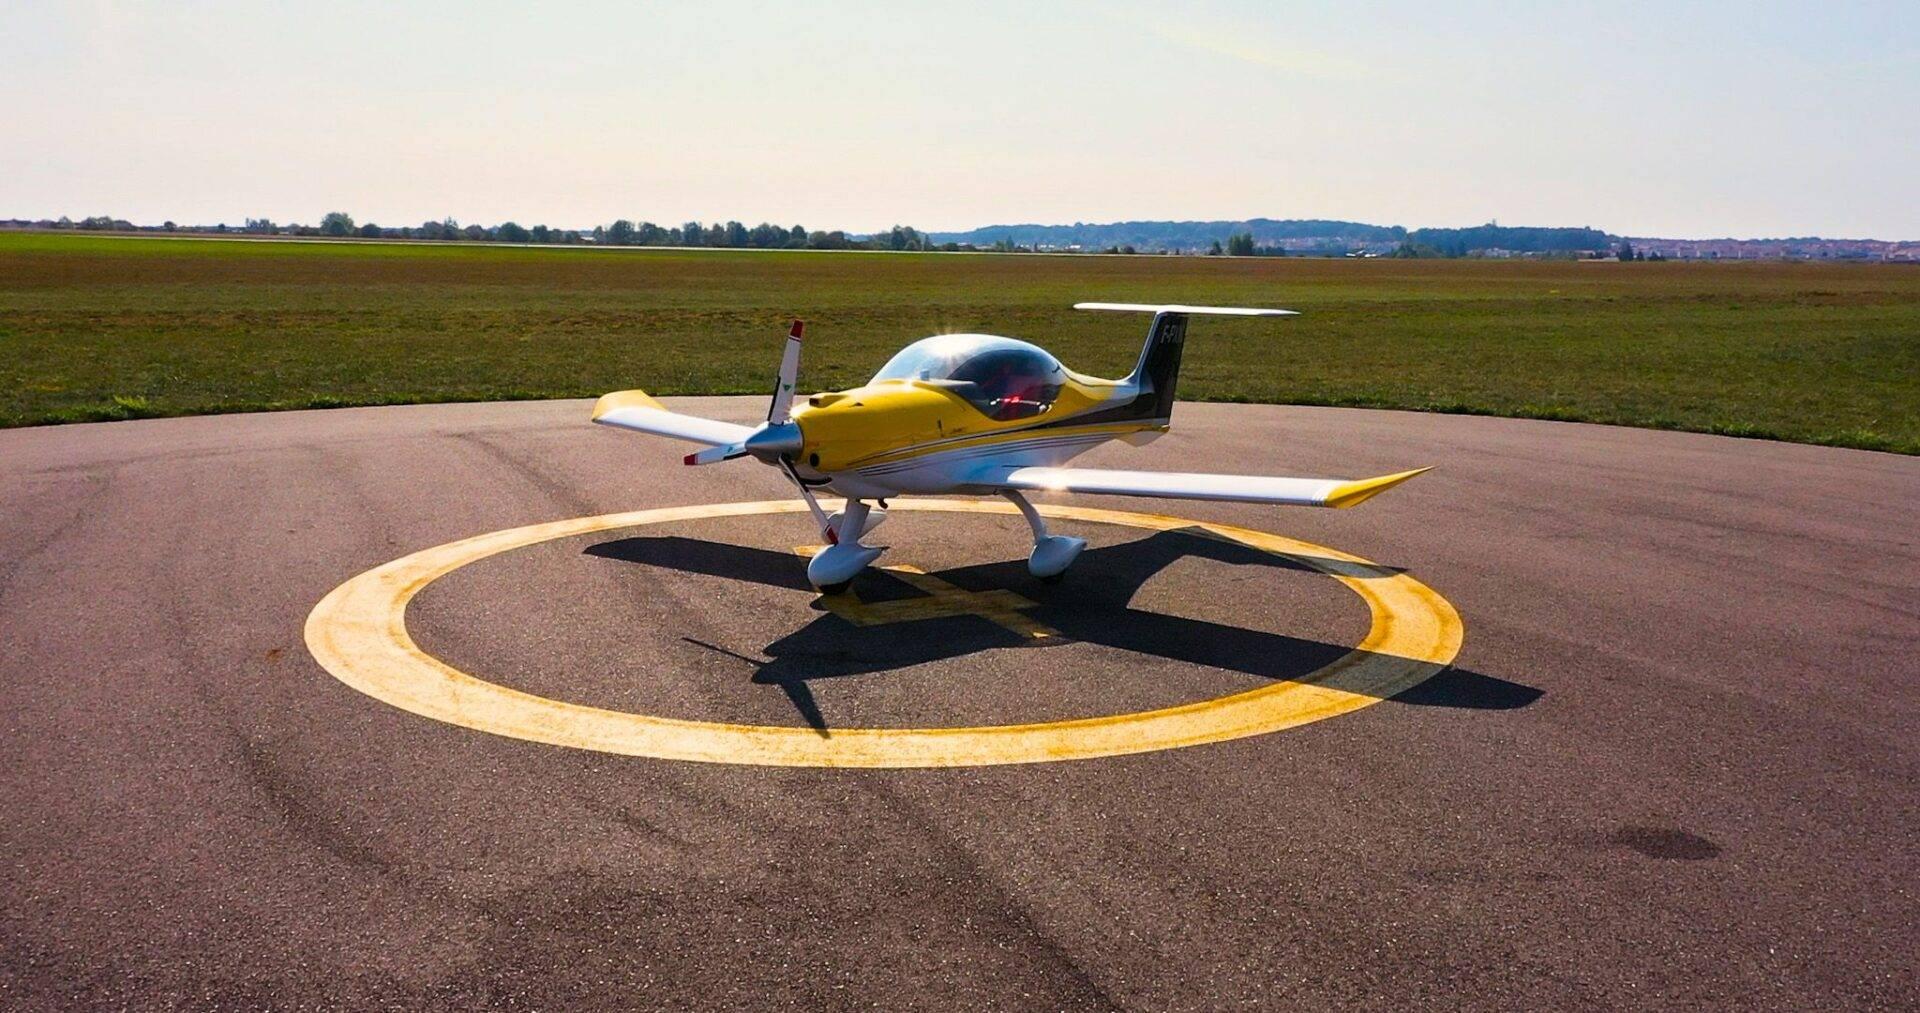 Modele SPORSTER EVOLUTION |MCR Evolution - SE Aviation Aircraft | La référence mondiale en MCR